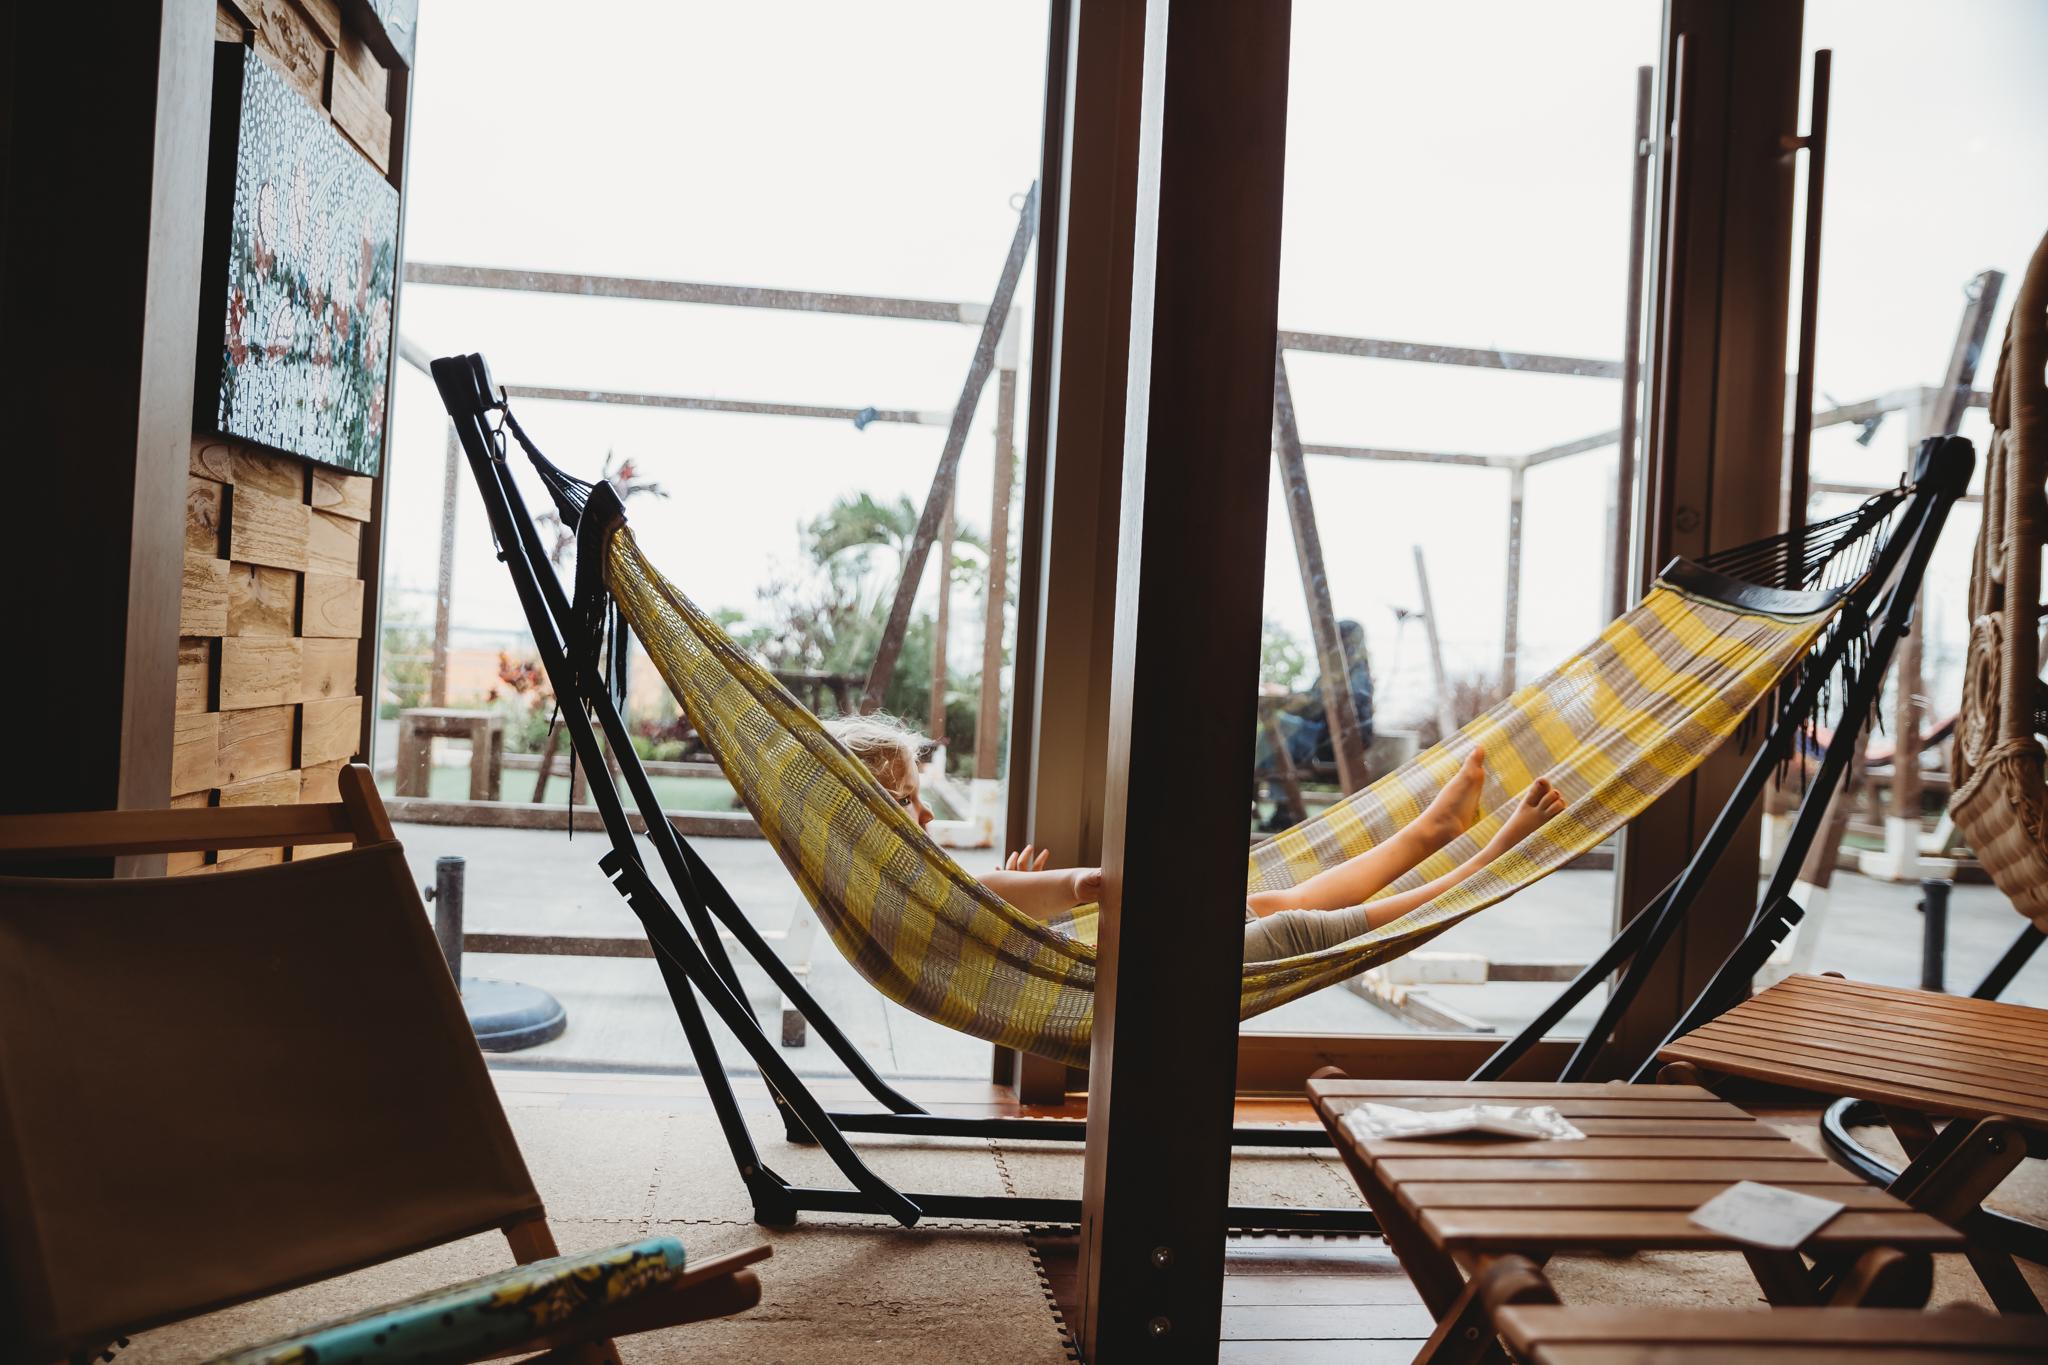 A hammock cafe where she tested every single hammock